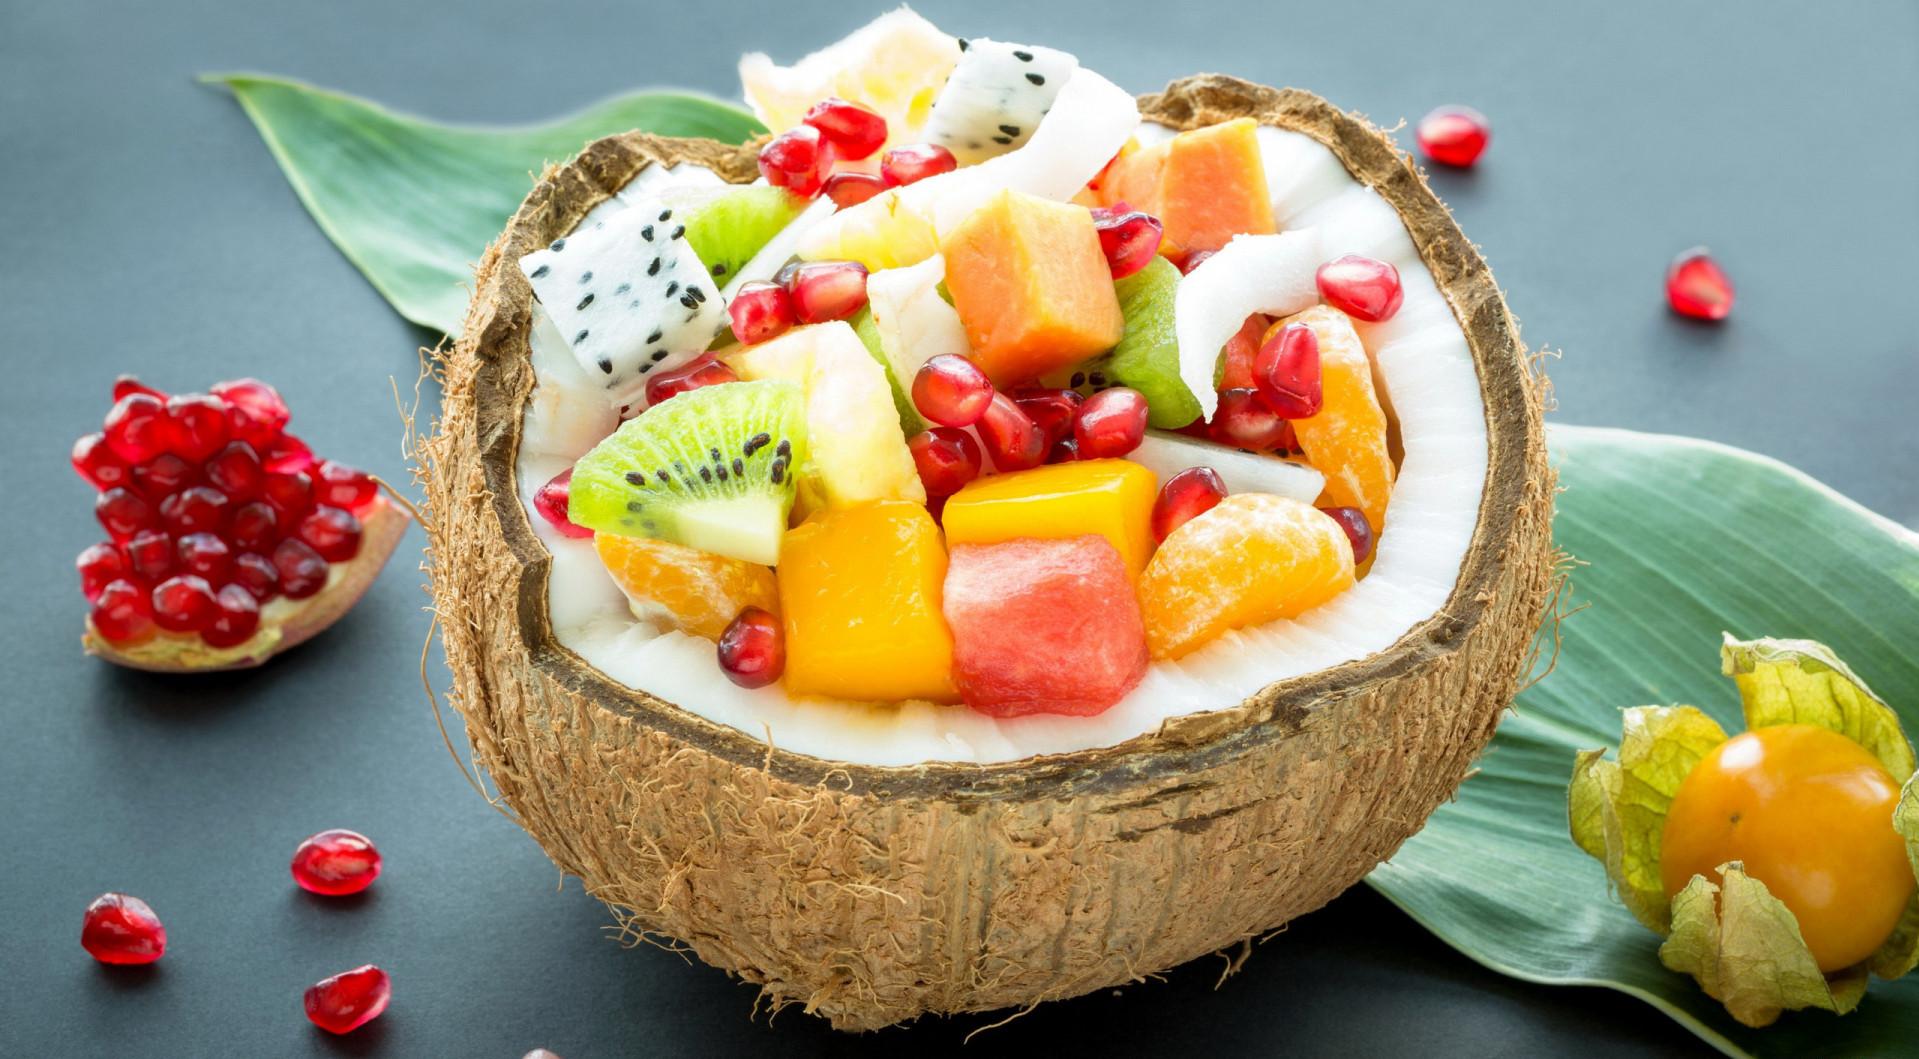 General 1919x1059 baskets colorful food fruit berries kiwi (fruit)